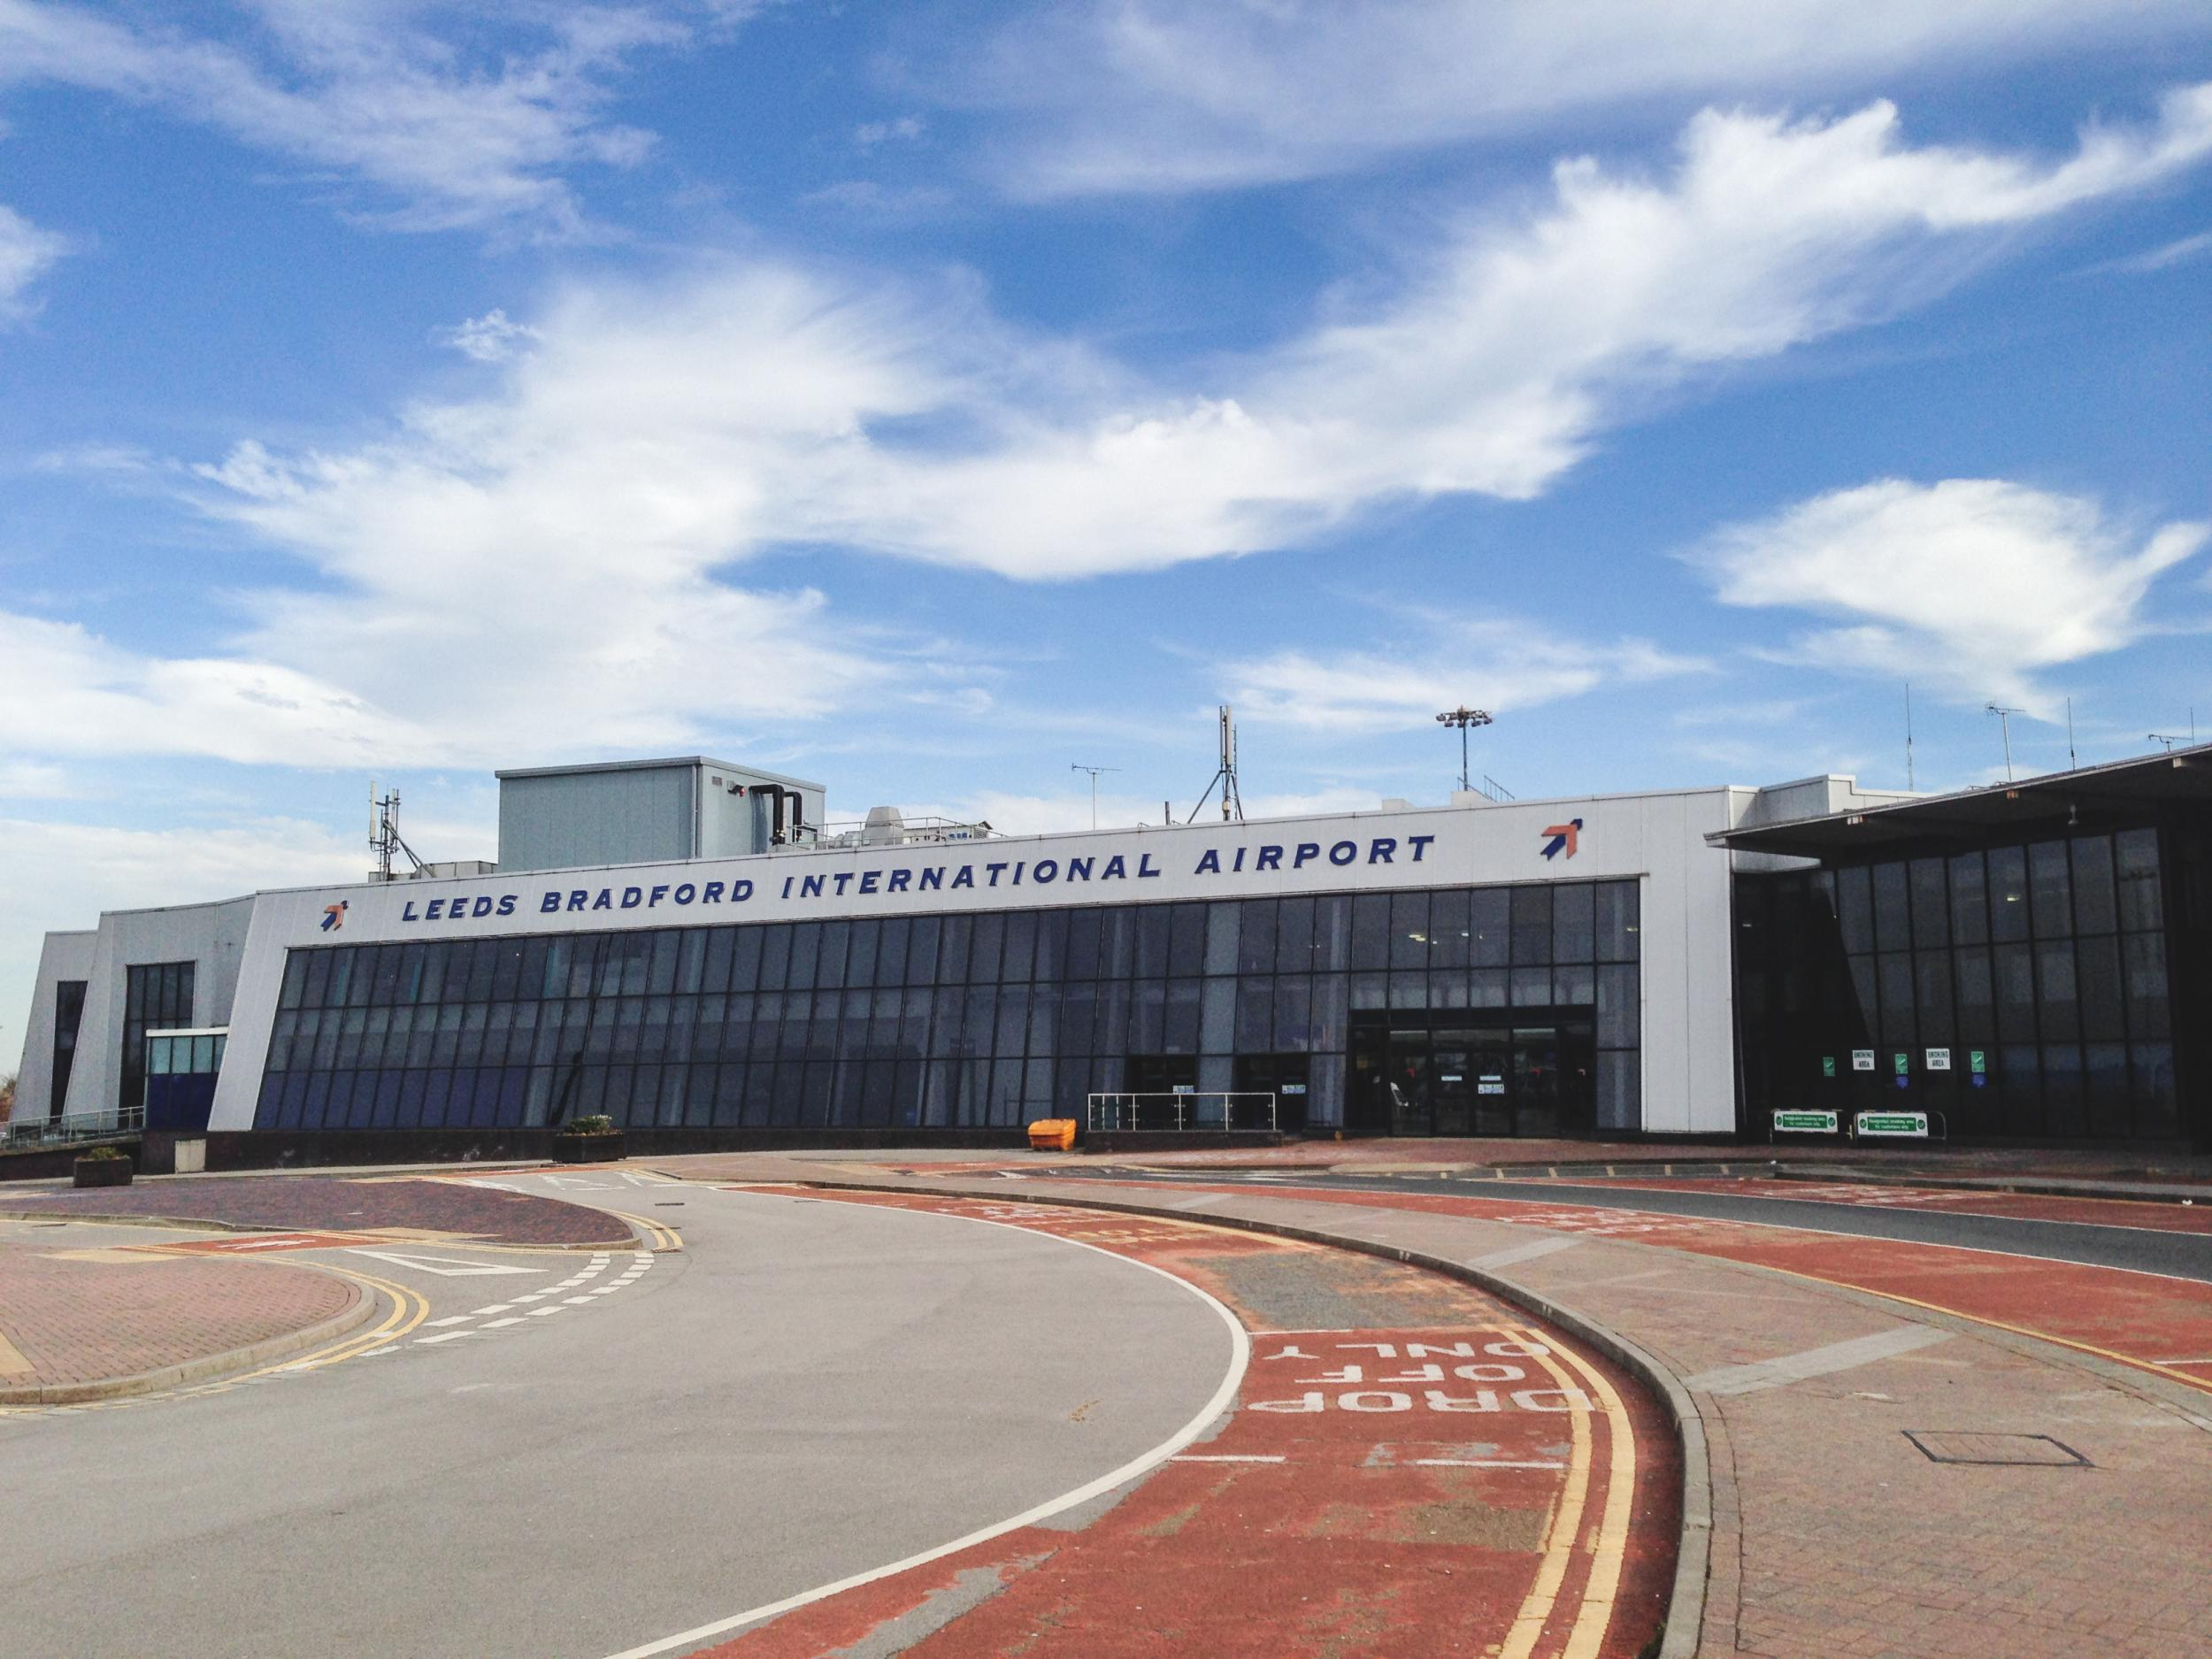 British Airways cancels all flights from Leeds Bradford airport